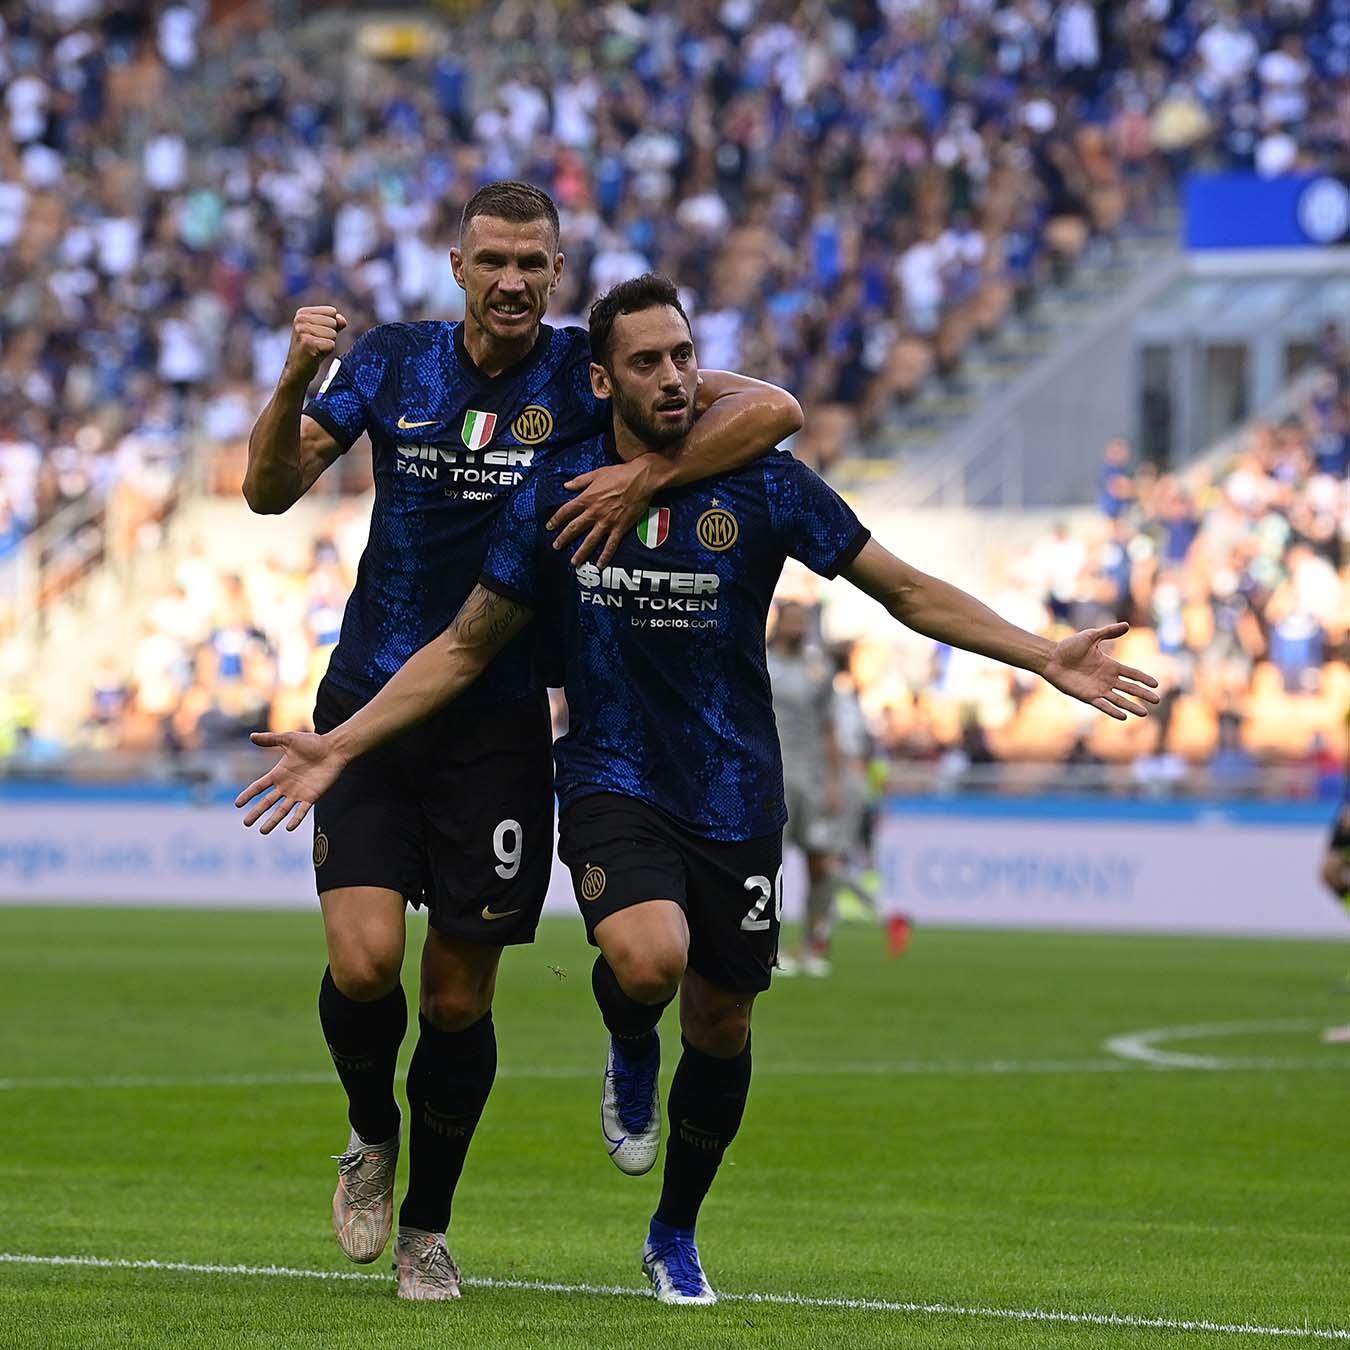 Bright rookie, Inter Milan